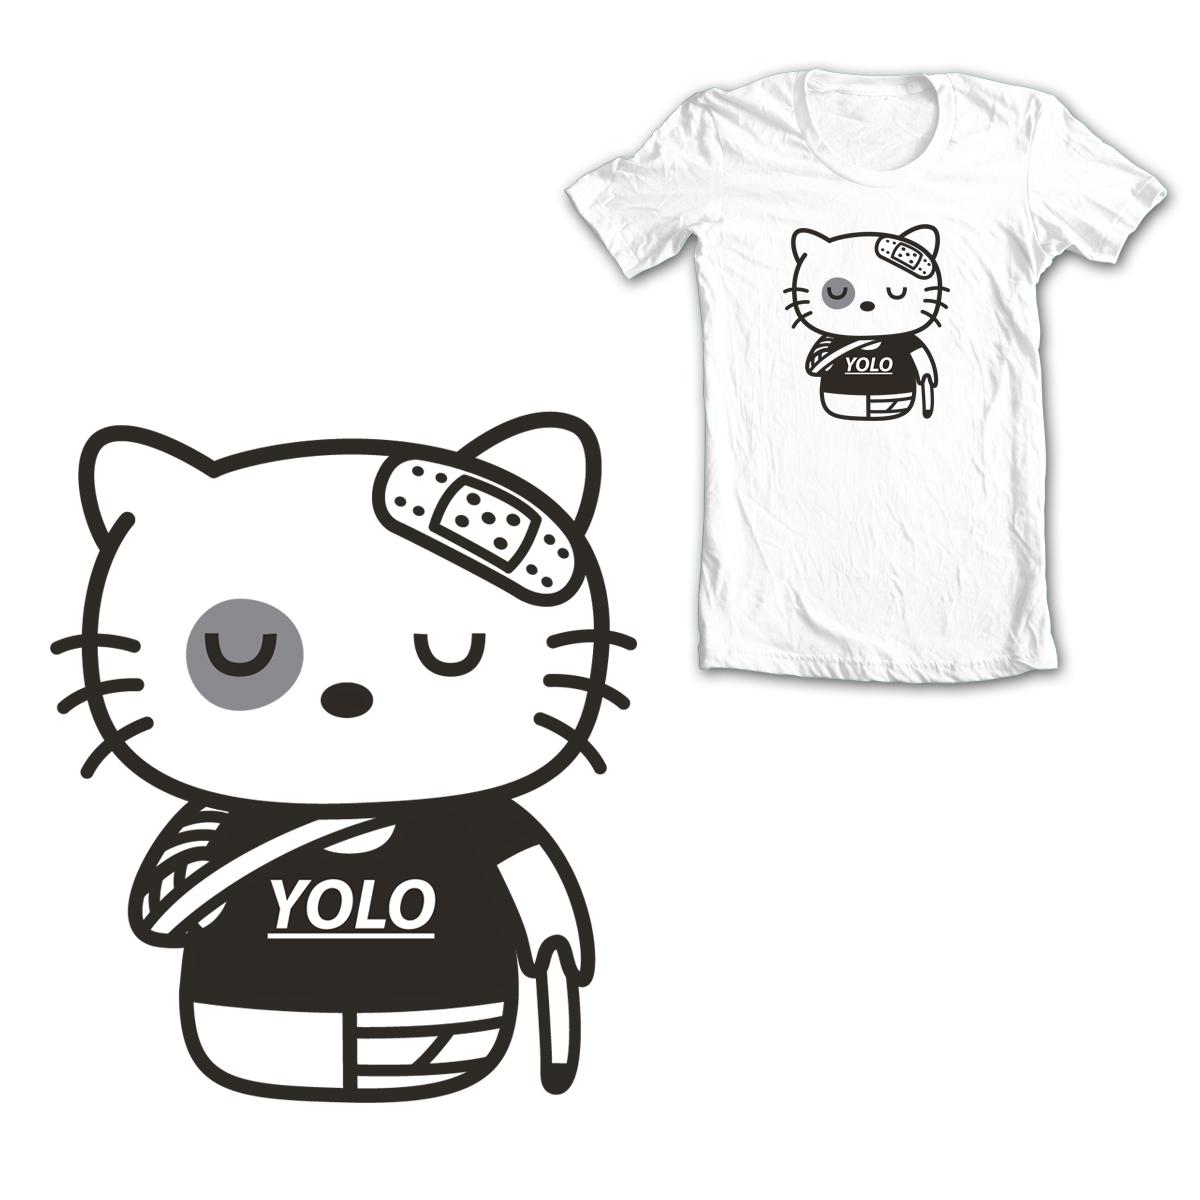 Yolo Kitty by krisren28 on Threadless